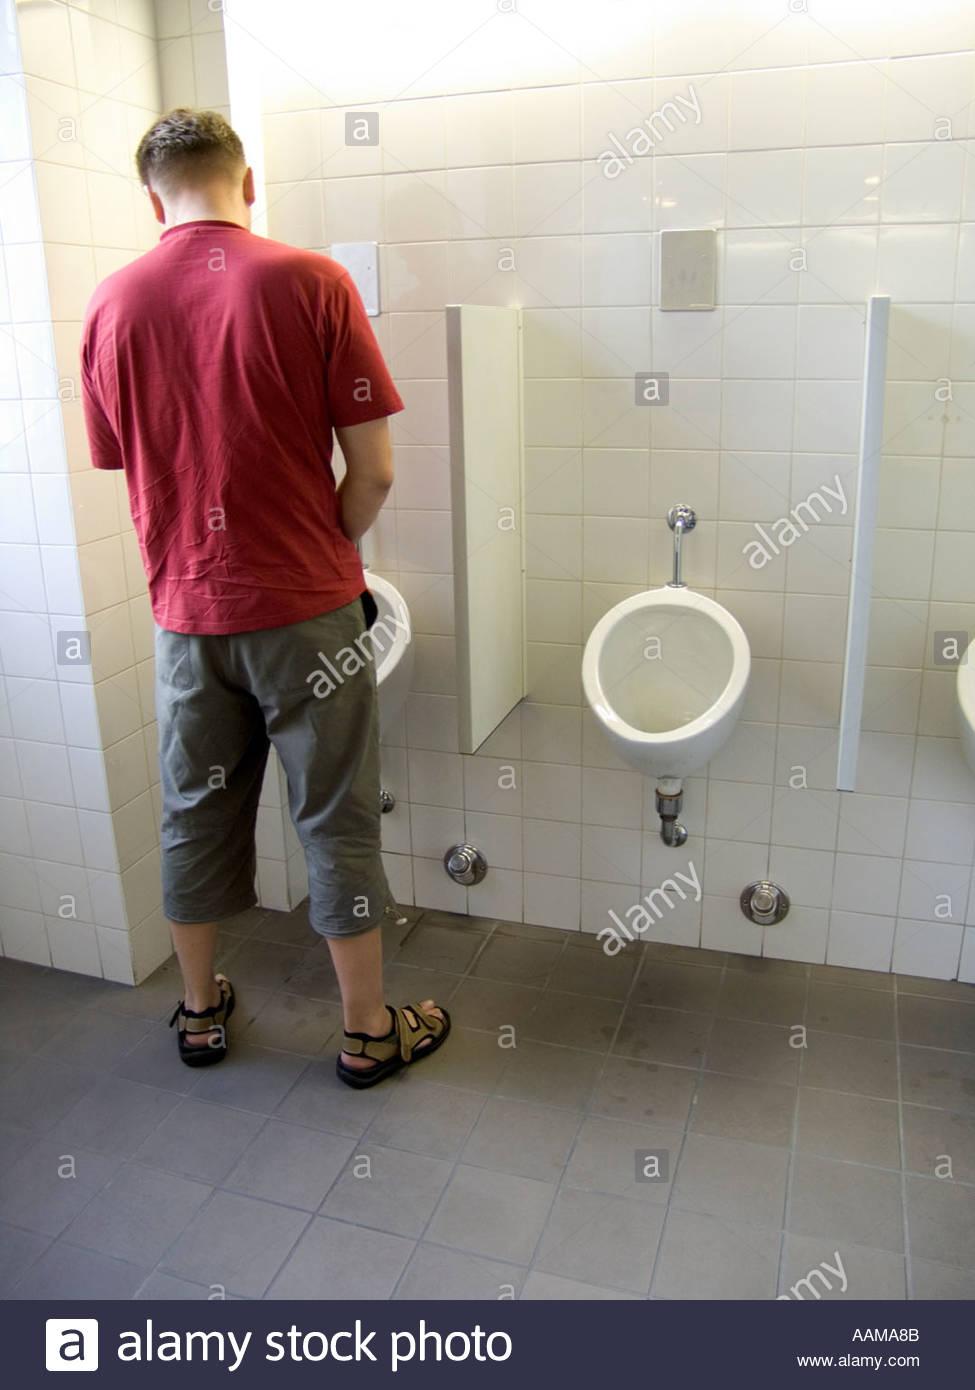 Man Using A Urinal In Mens Public Lavatory